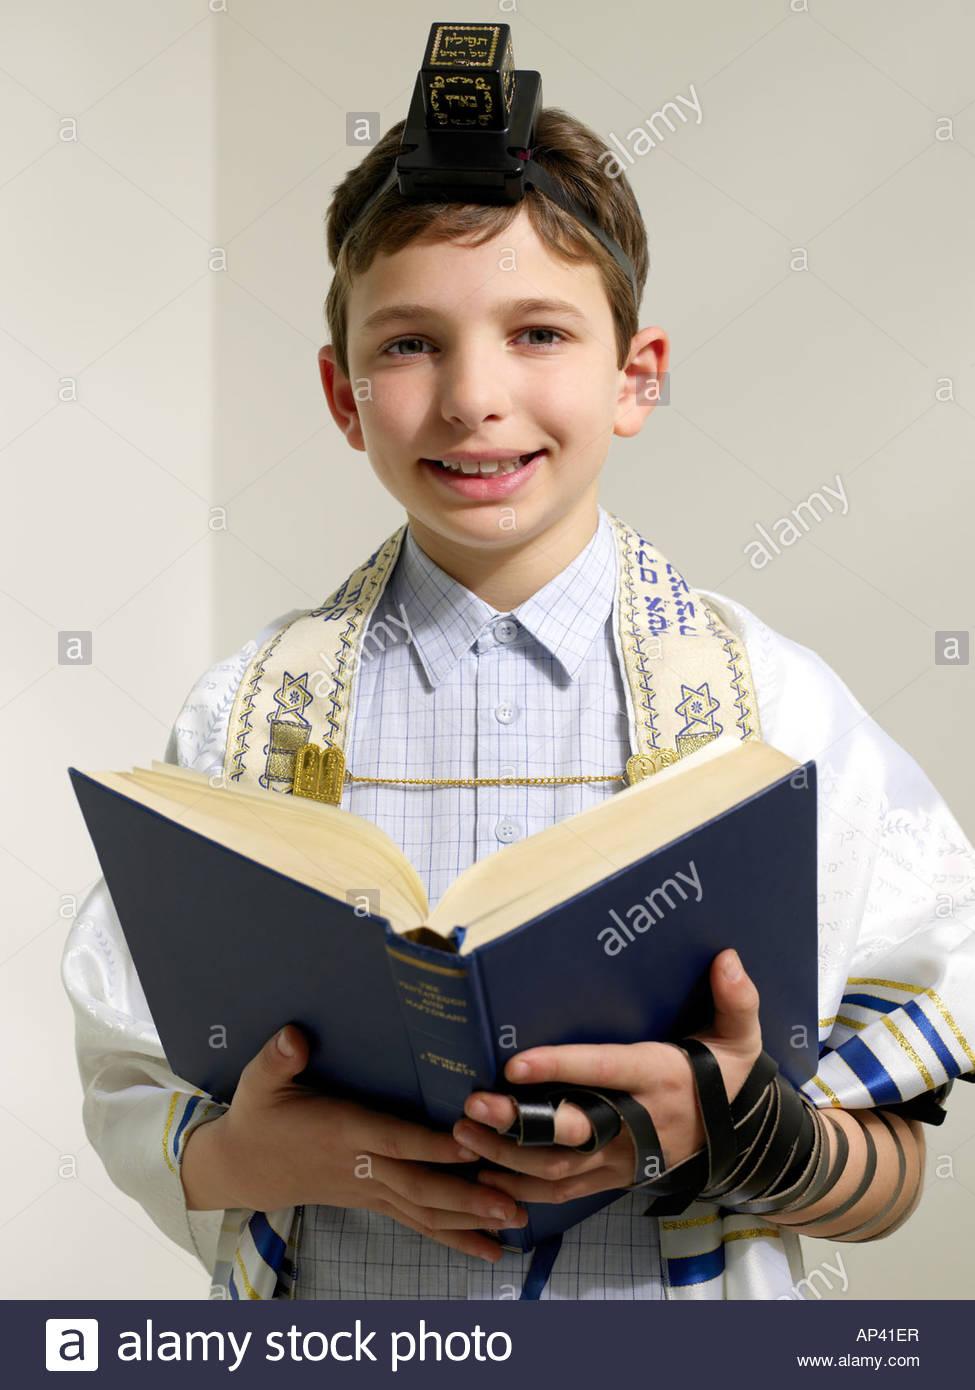 Jewish boy reading from siddur - Stock Image